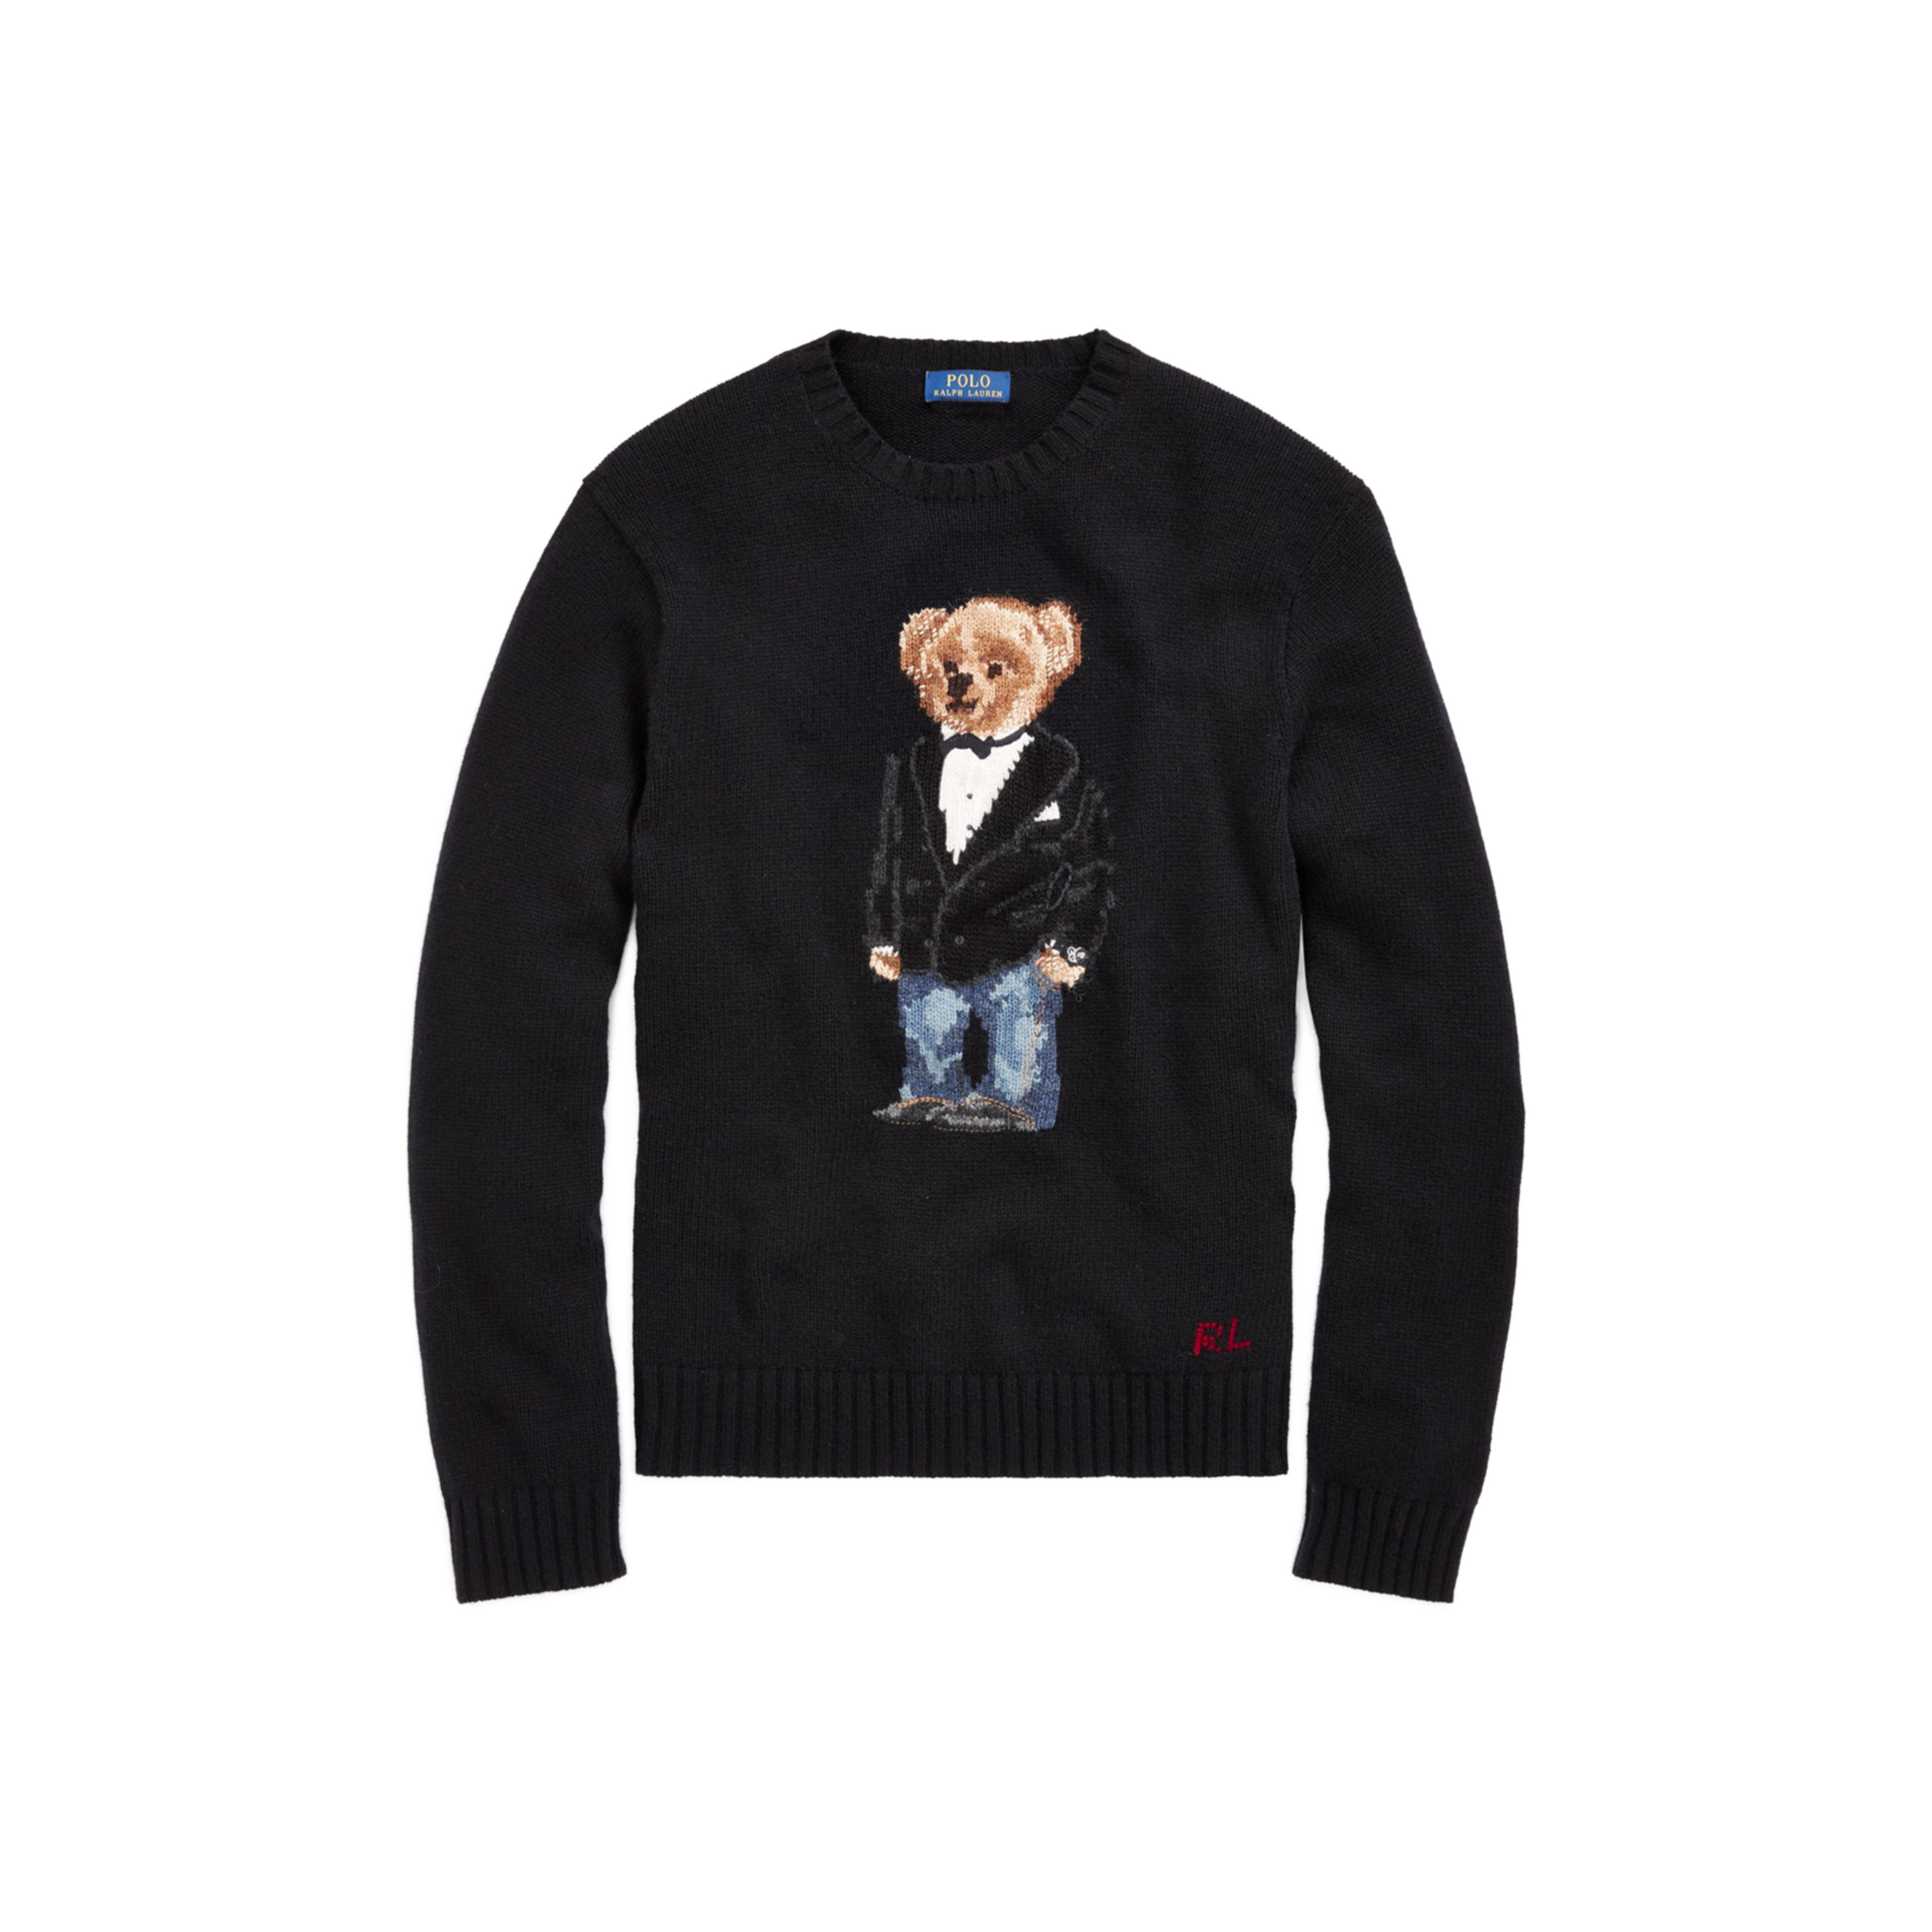 0e2d20f5 Polo Ralph Lauren Tuxedo Bear Wool Jumper in Black for Men - Lyst